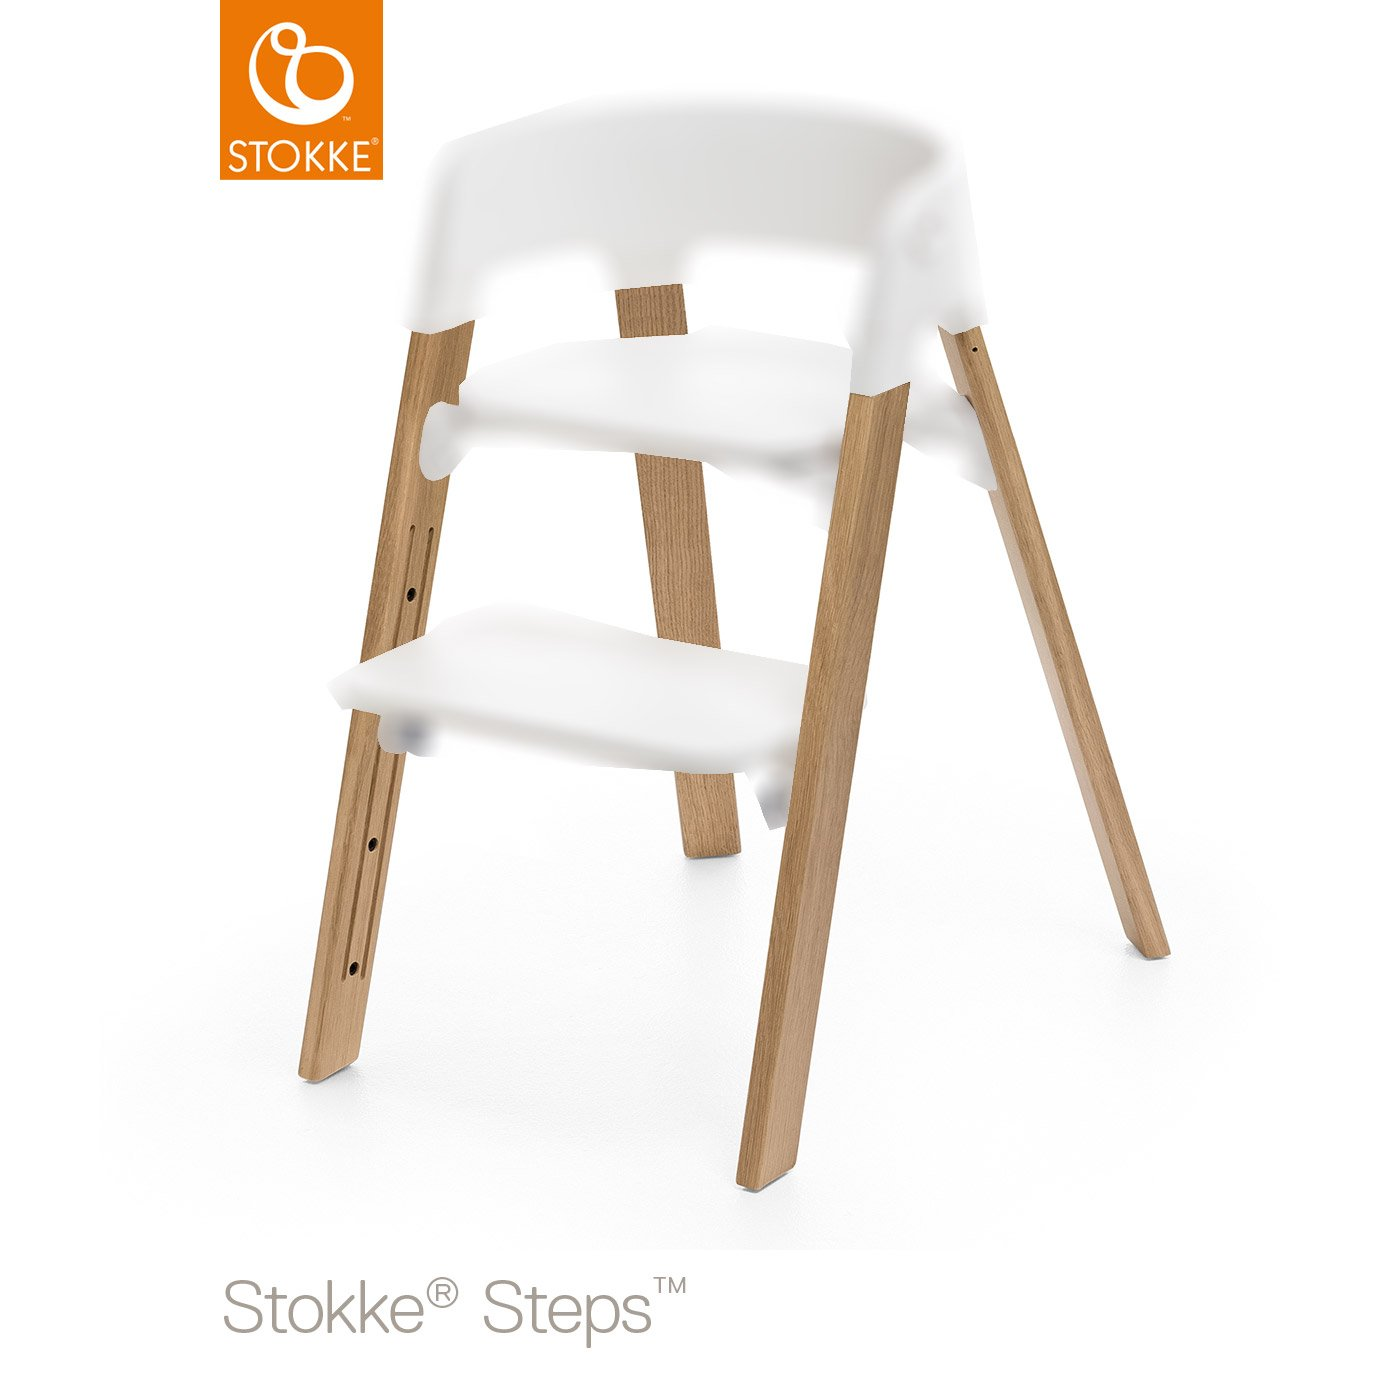 StepsTM Pieds Chene Naturel De StokkeR Chaises Hautes Evolutives